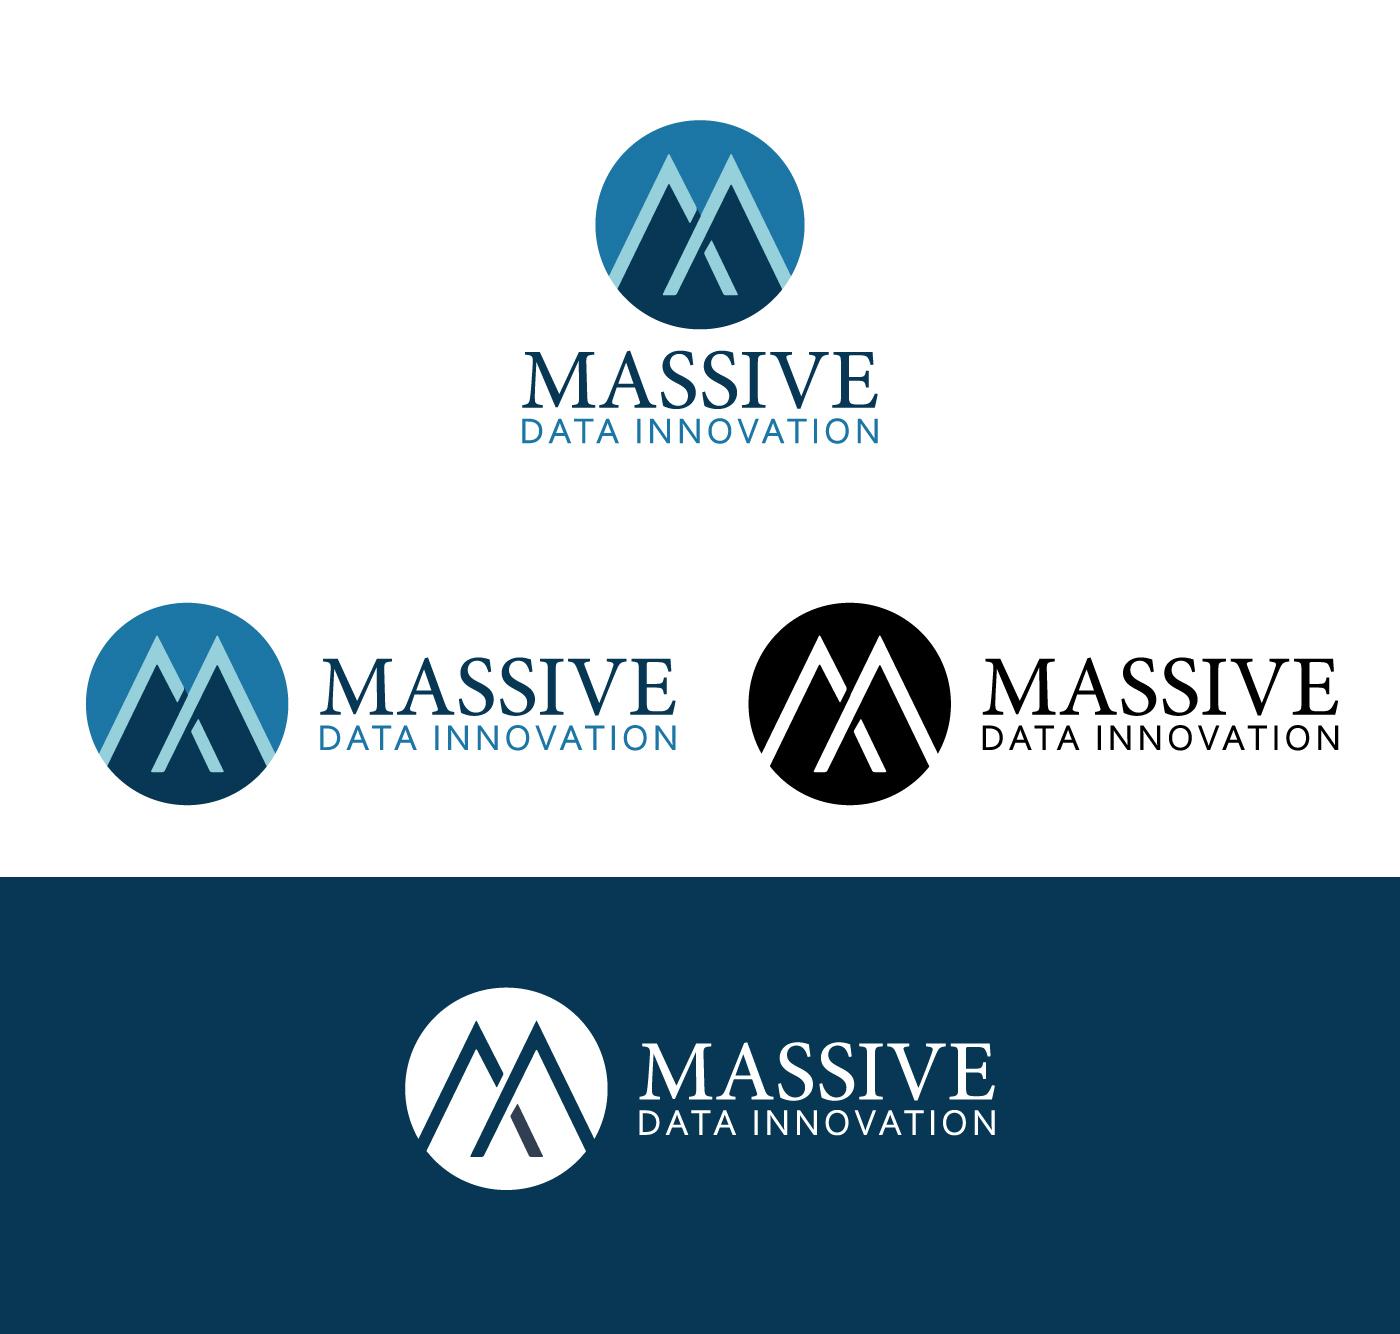 Logo Design by Sami Baig - Entry No. 452 in the Logo Design Contest MASSIVE LOGO.